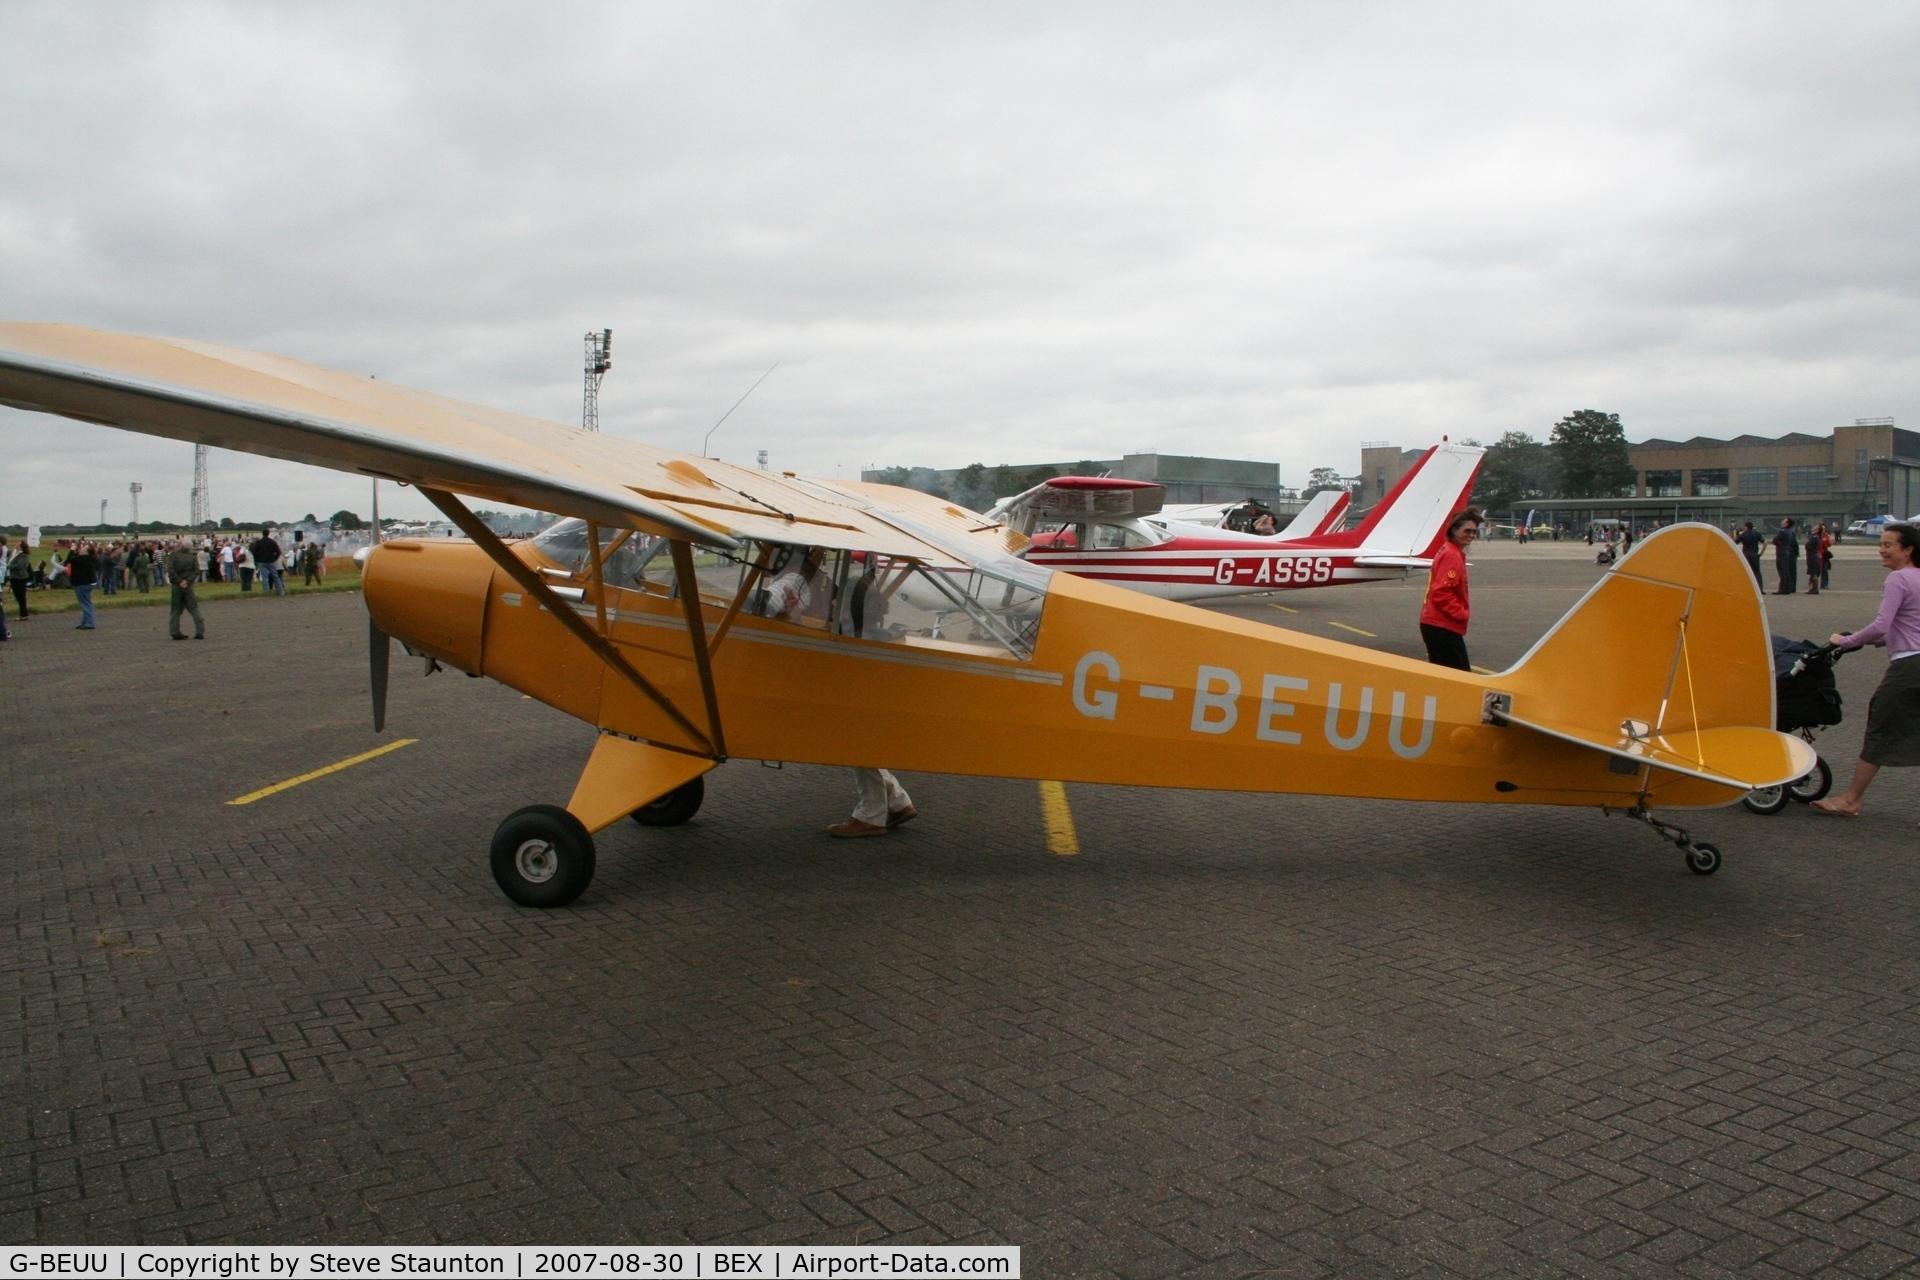 G-BEUU, 1951 Piper L-18C Super Cub (PA-18-95) C/N 18-1551, RAF Benson Families Day, RAF Benson, Oxfordshire, England - August 2007